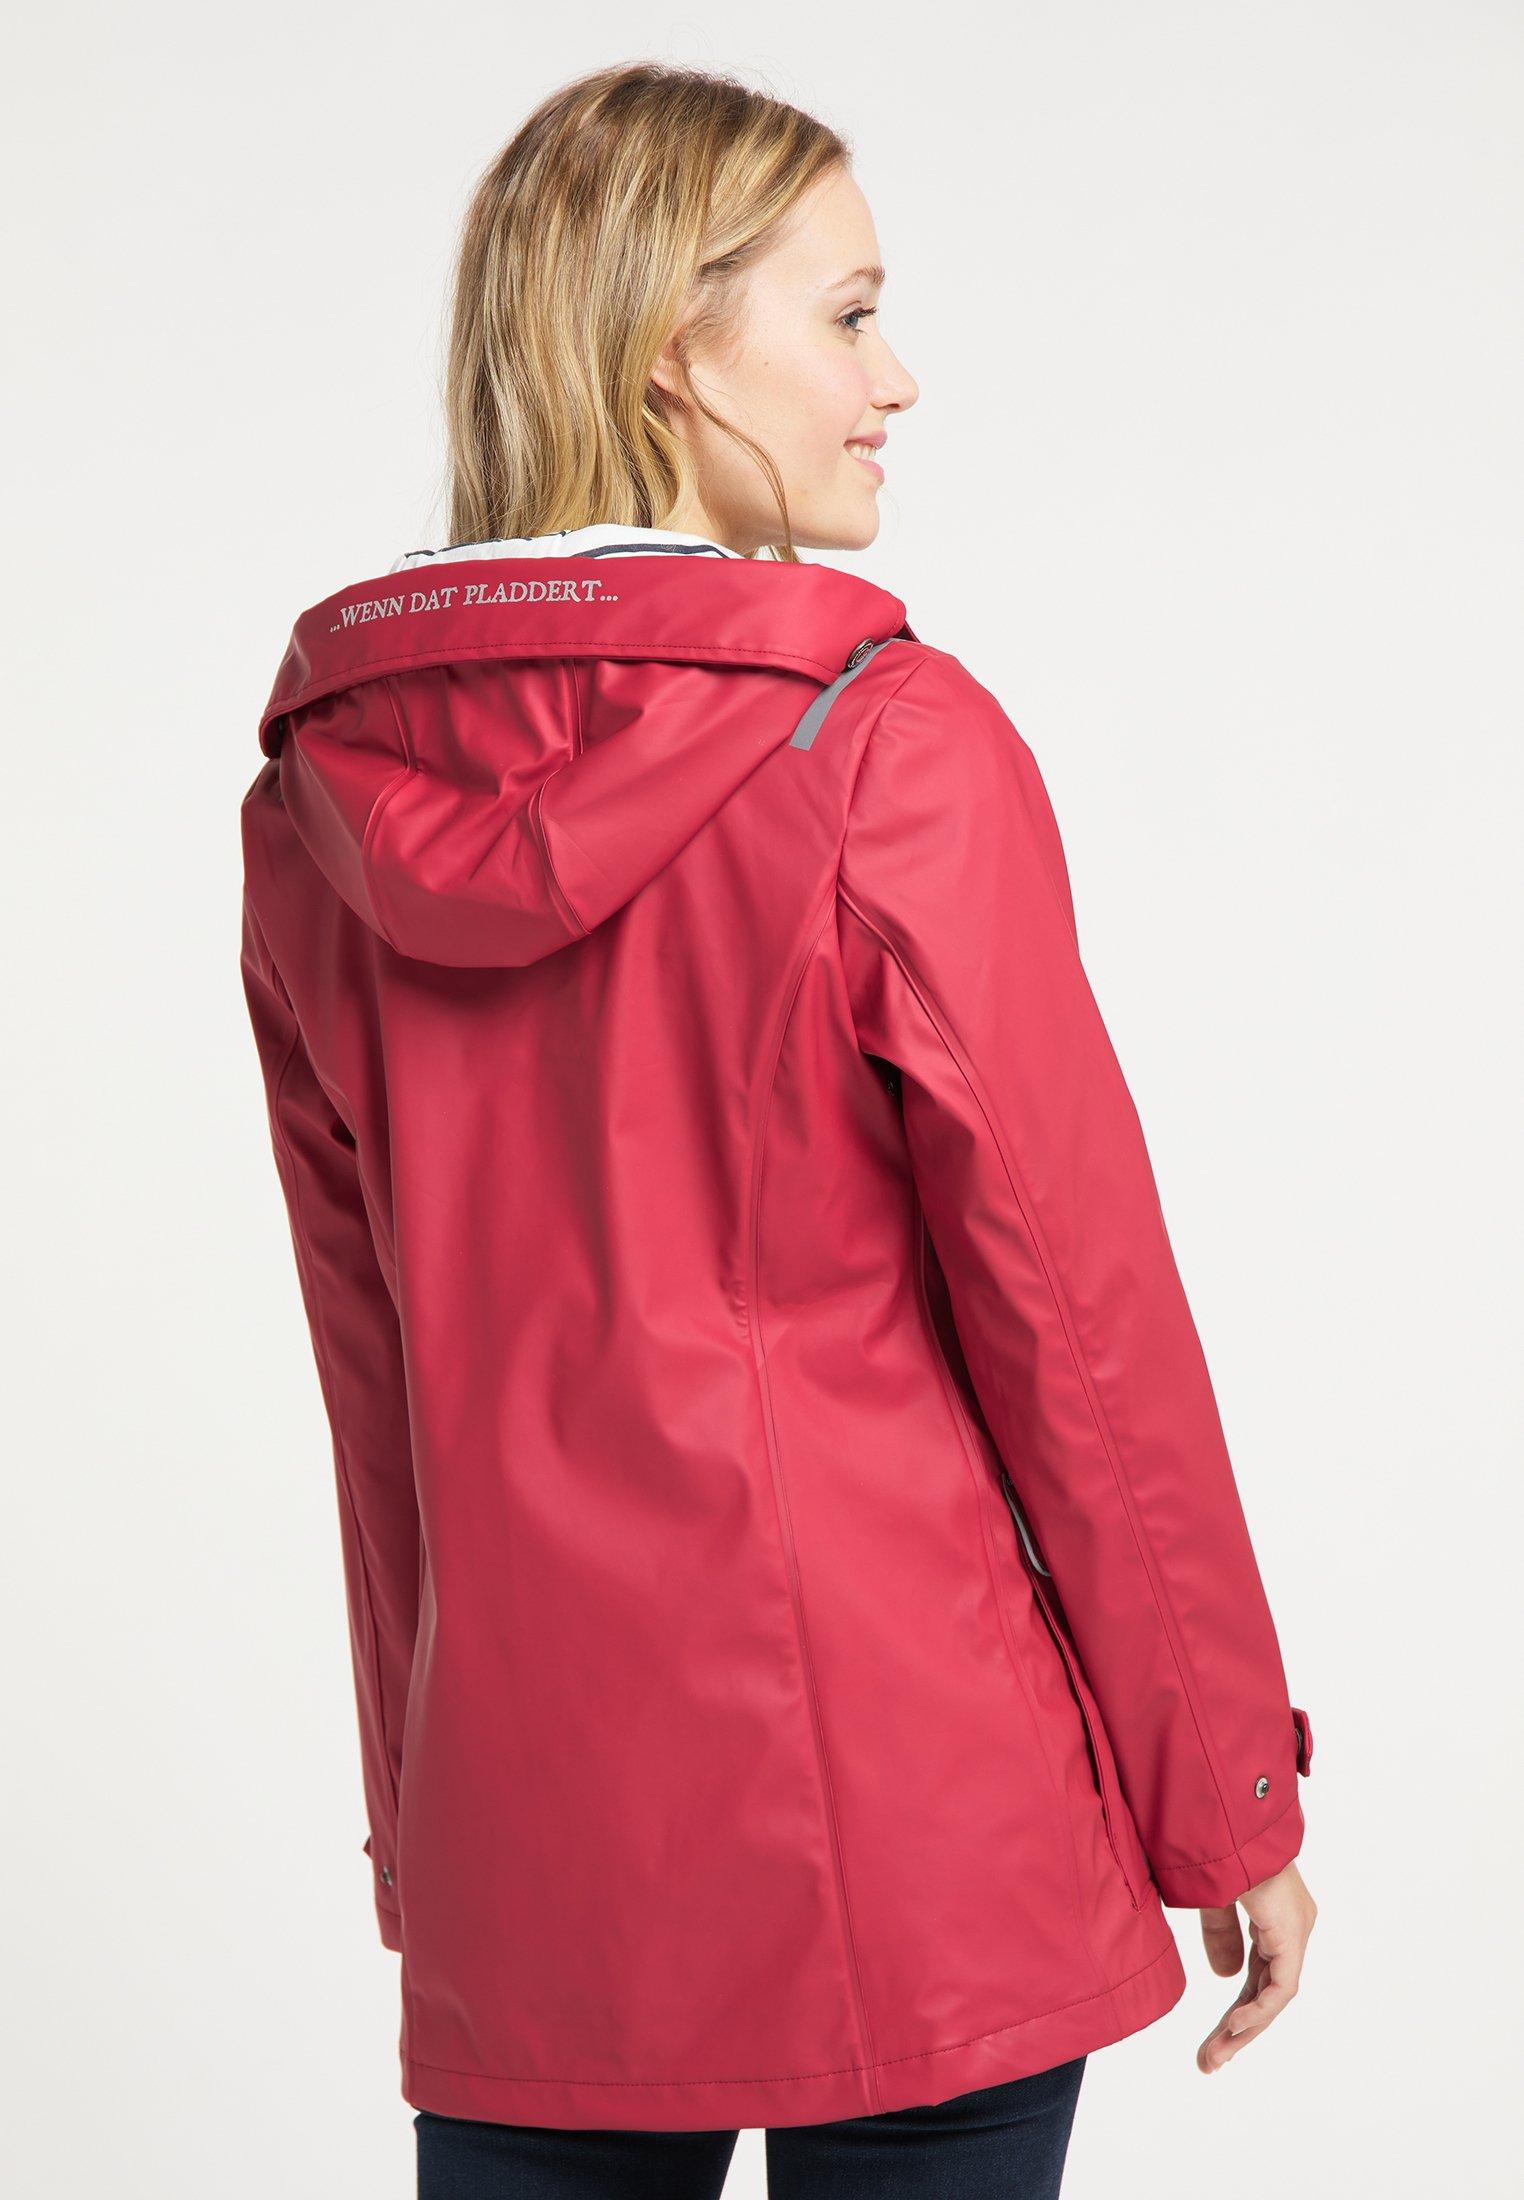 Low Cost Women's Clothing Schmuddelwedda Parka rot IZZlsDmV8